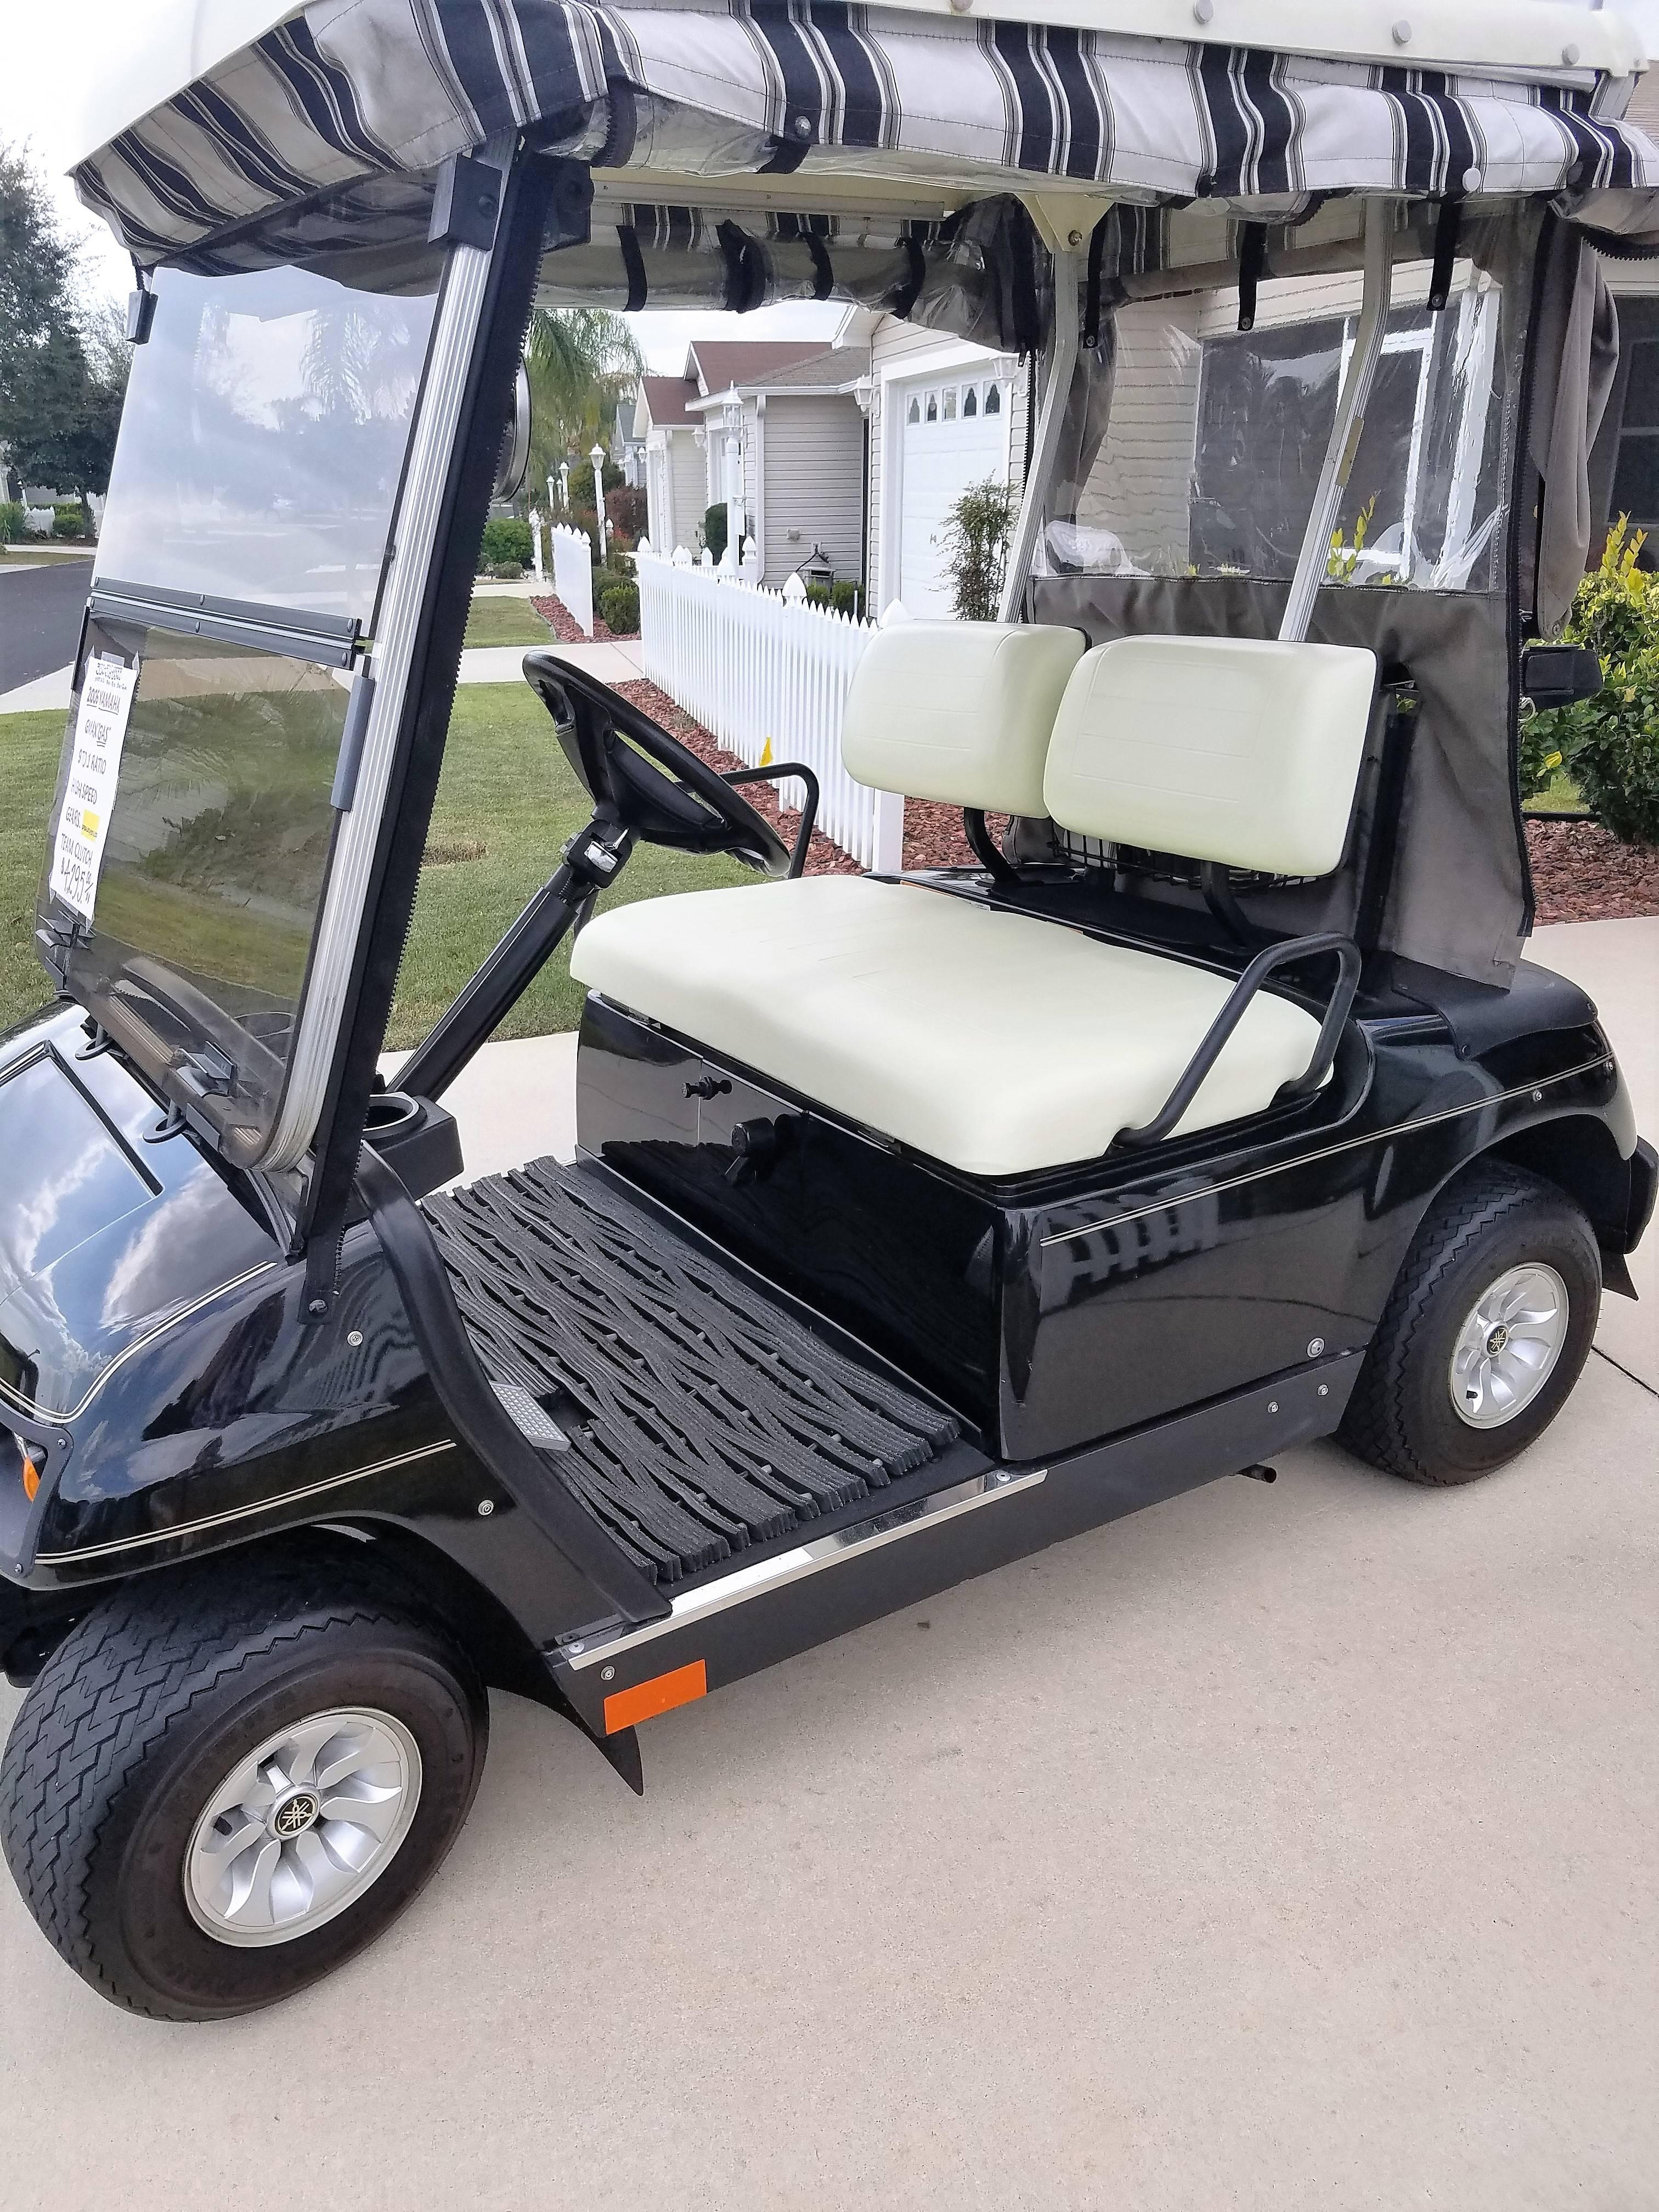 2006 Yamaha Gmax GAS golf cart